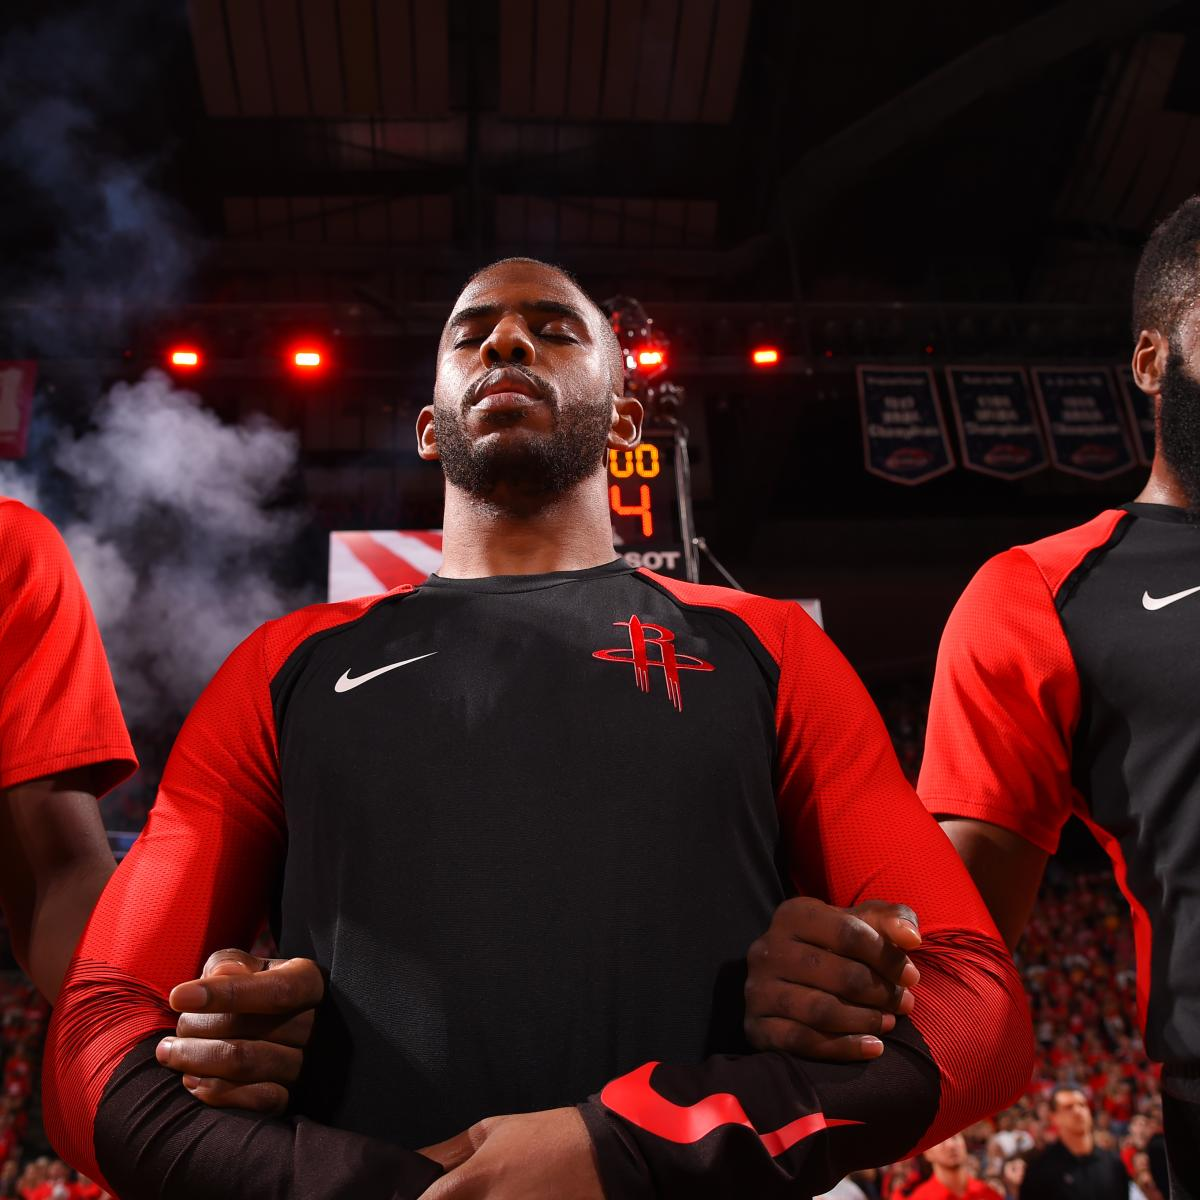 Rockets Vs Warriors Game 7 Where: Look: Rockets Fan Skips College Graduation To Attend